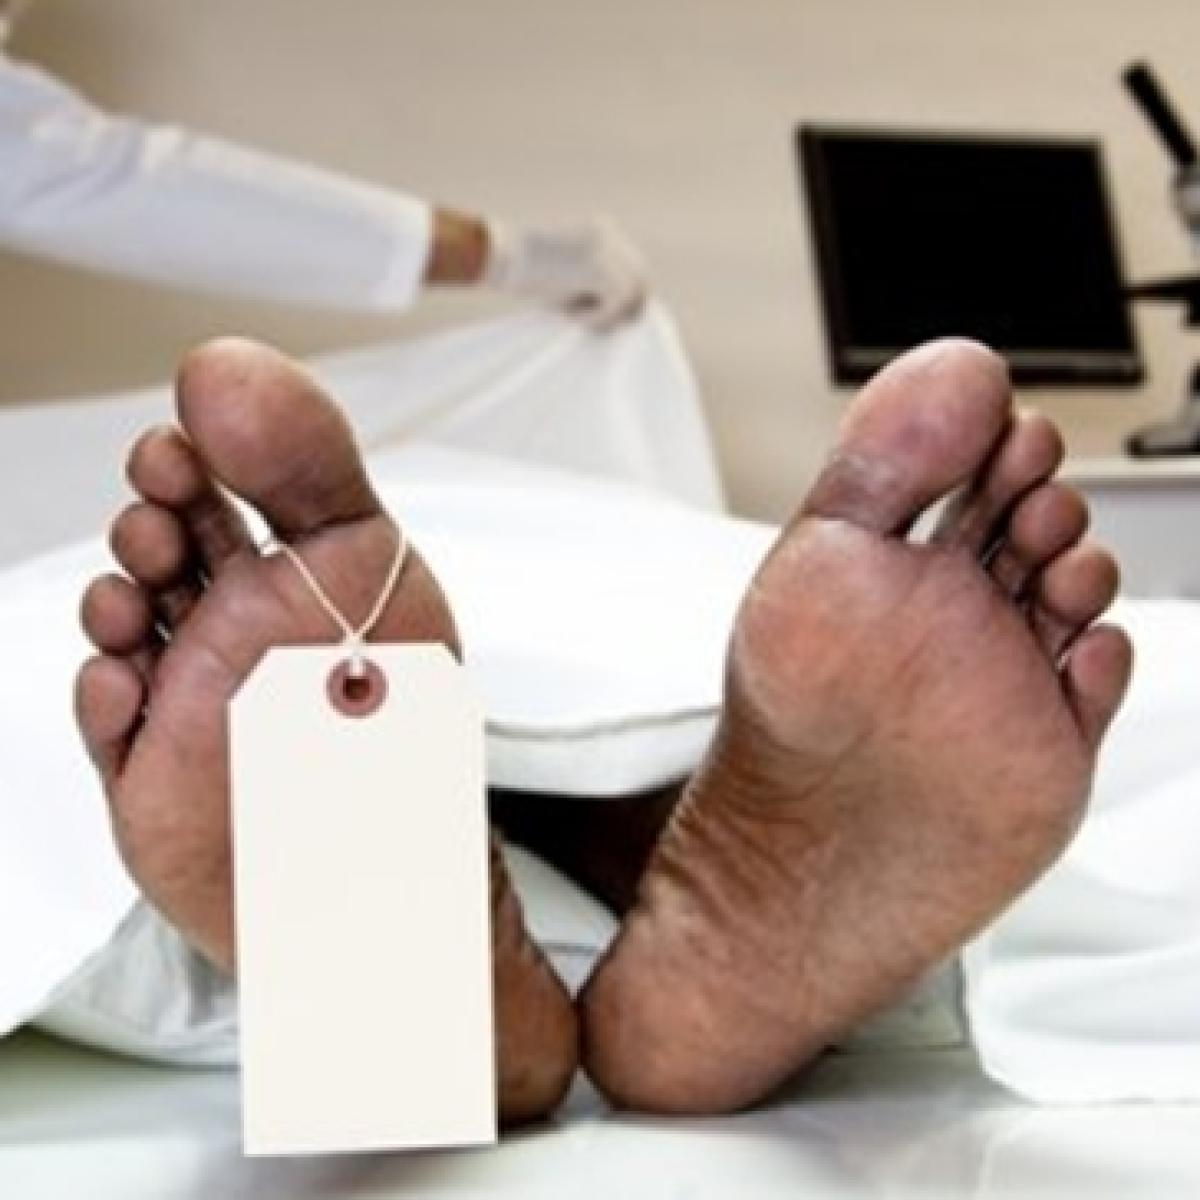 Coronavirus in Navi Mumbai: Body of migrant labourer sent for COVID-19 testing goes 'missing' from Vashi Hospital